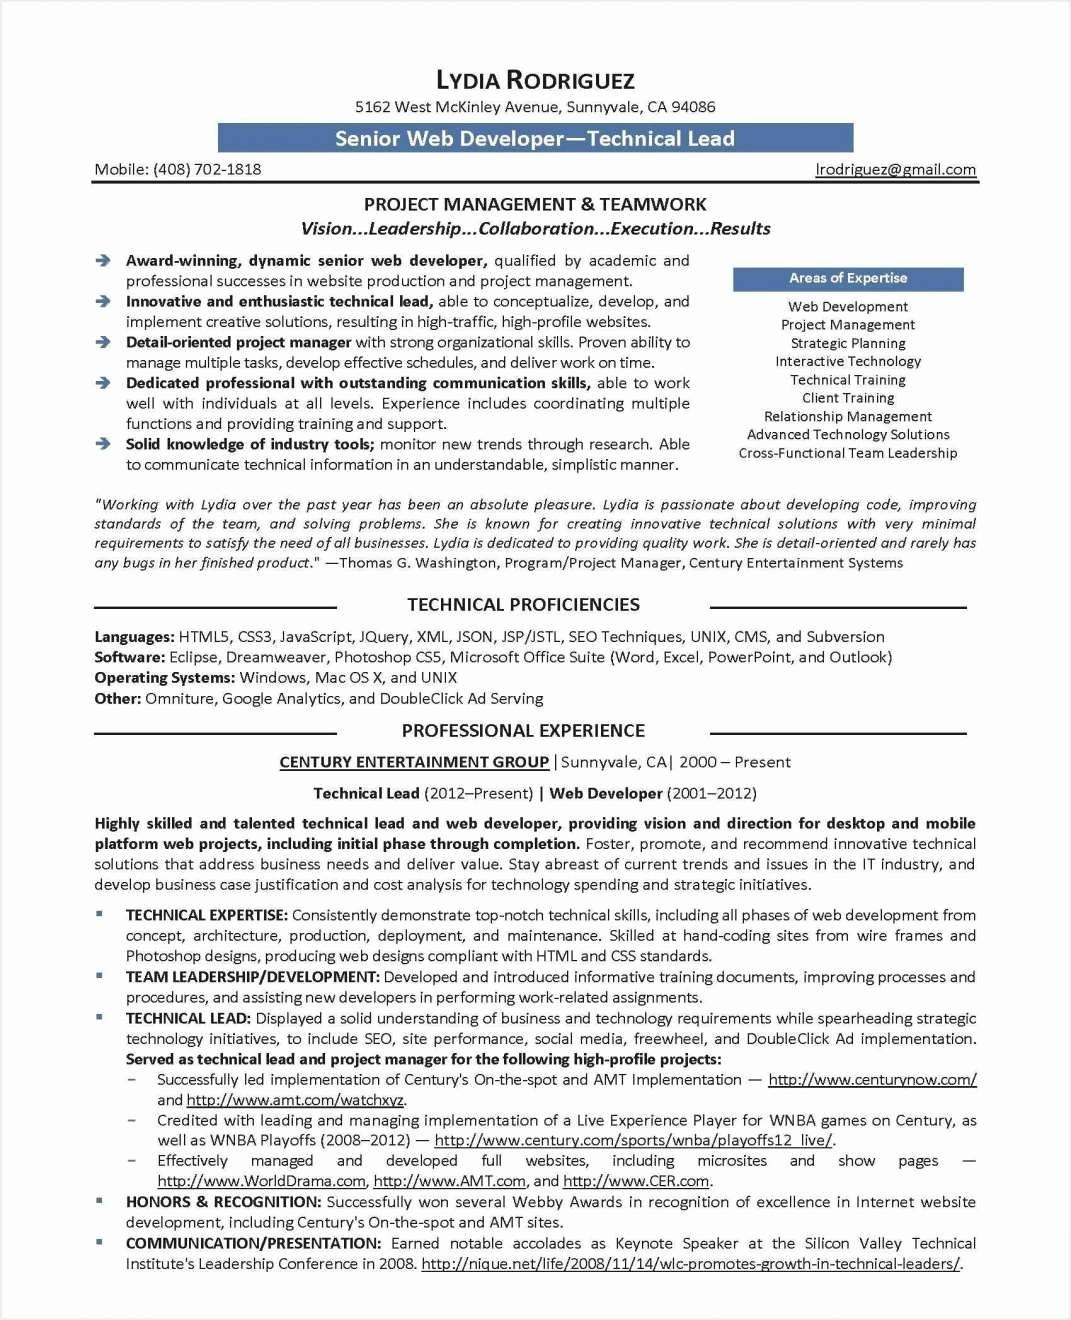 Free Resume Templates 2017 Word Elegant Free Microsoft Resume Templates Letter Examples 2018 Ms